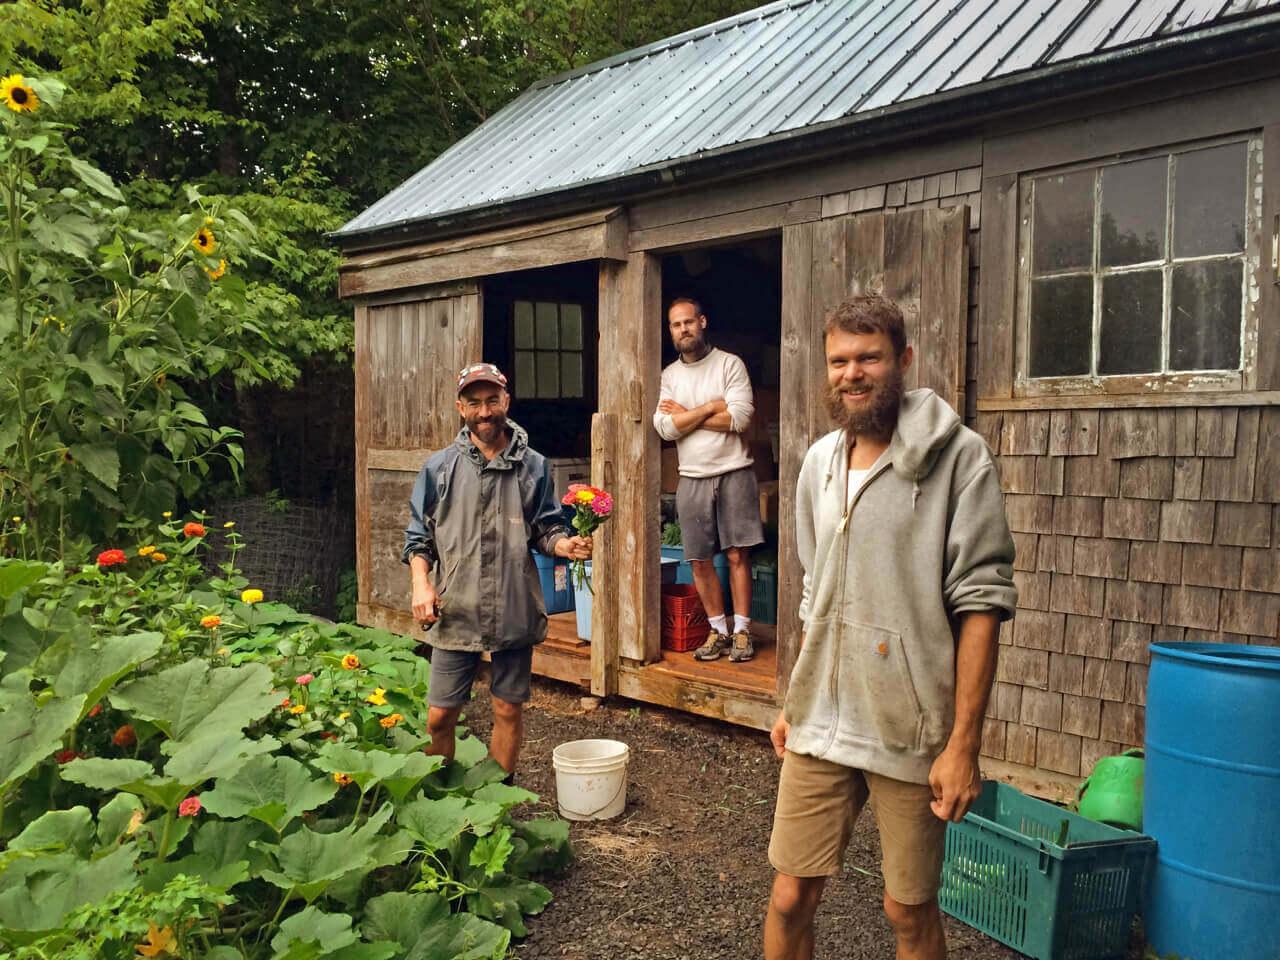 We prepare for market in the garden